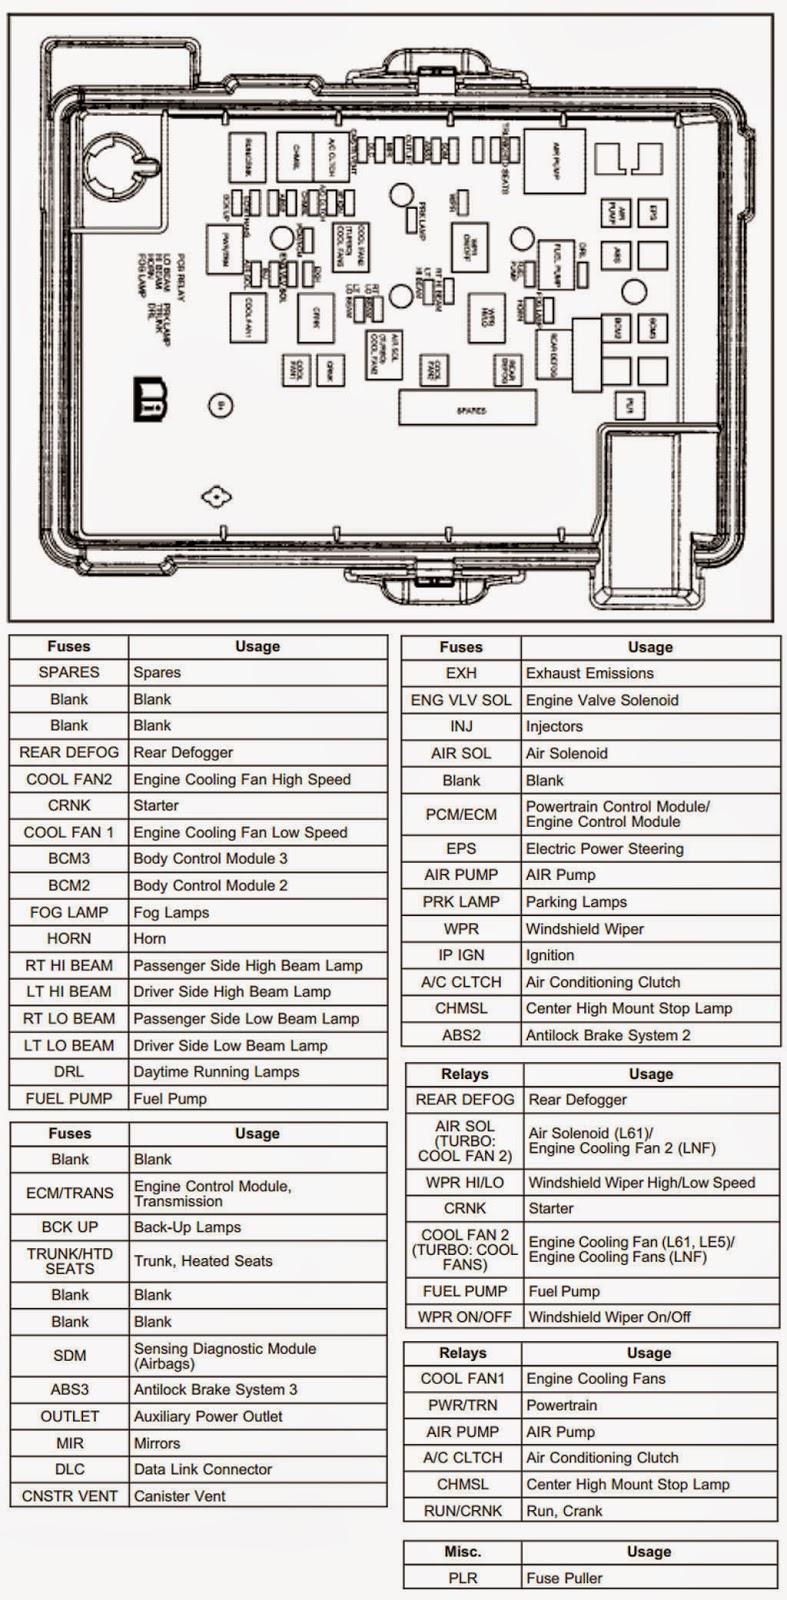 2010 Pt Cruiser Fuse Box Diagram | Wiring Library - 2006 Pt Cruiser Cooling Fan Wiring Diagram